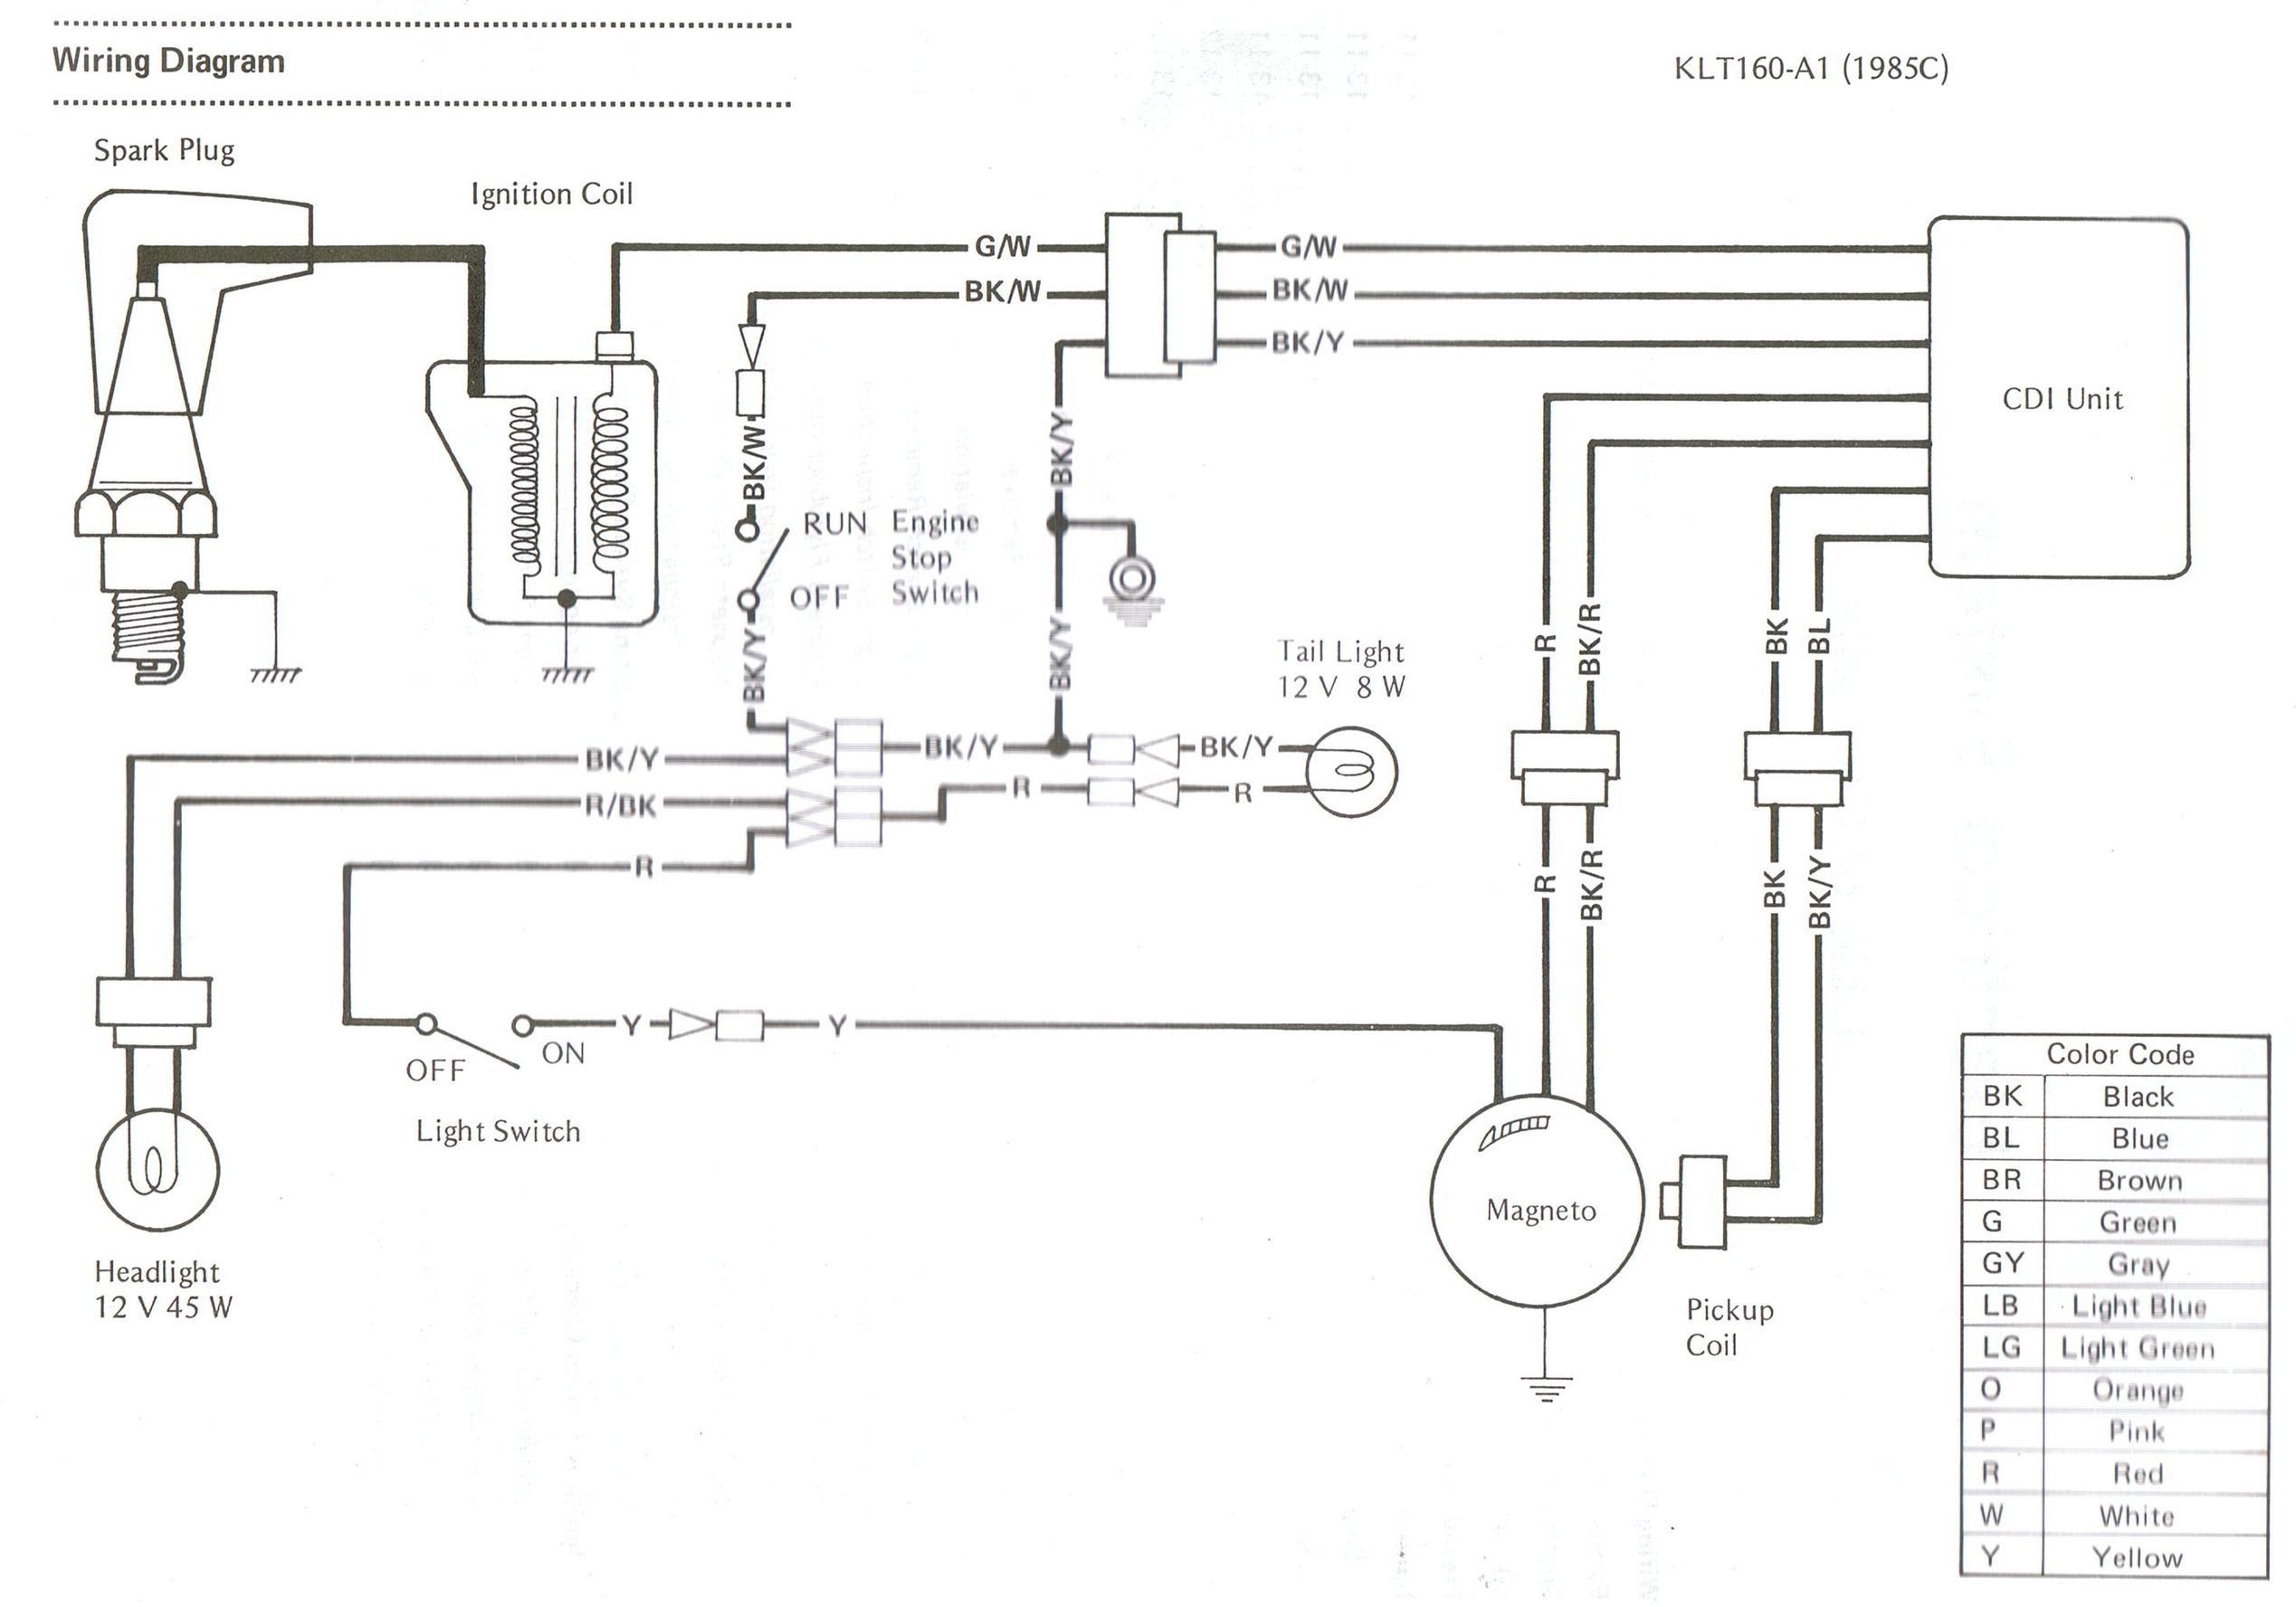 3wheeler World Kawasaki Three Wheeler Wiring Diagrams